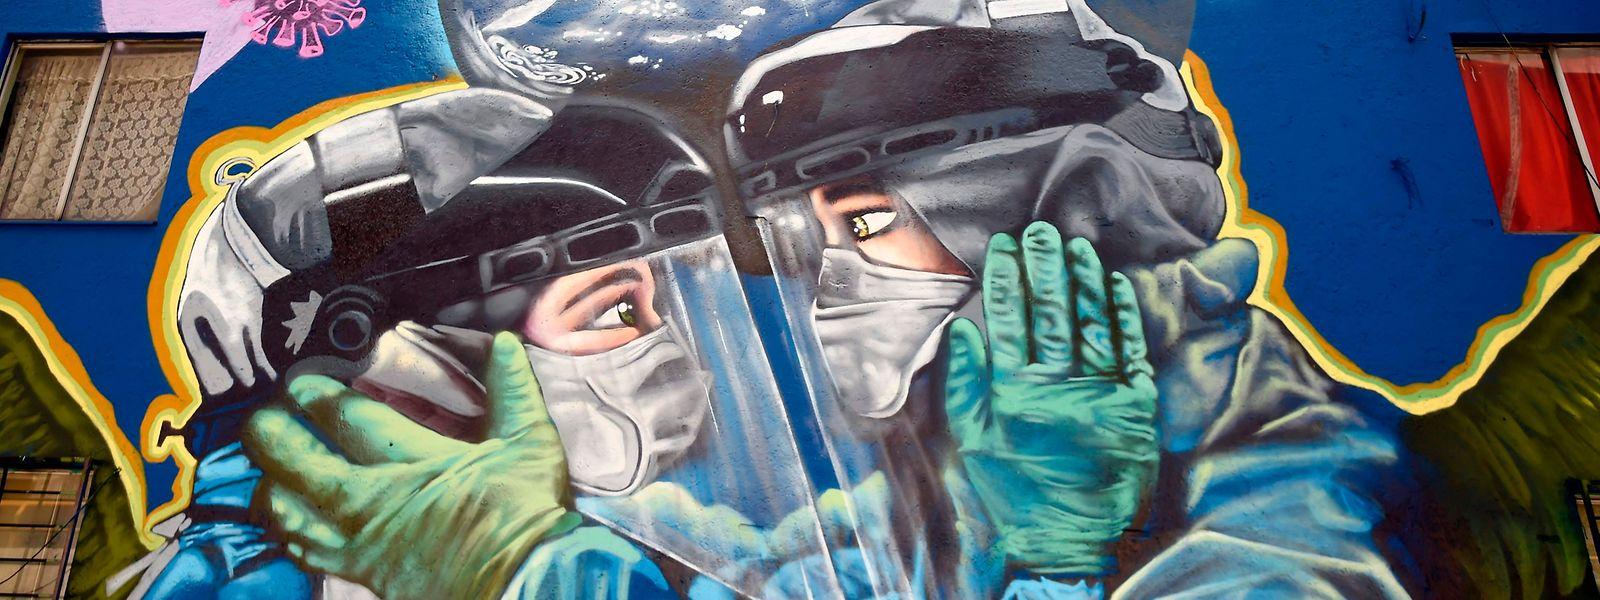 Mural dedicado à pandemia da covid-19 na Cidade do México.